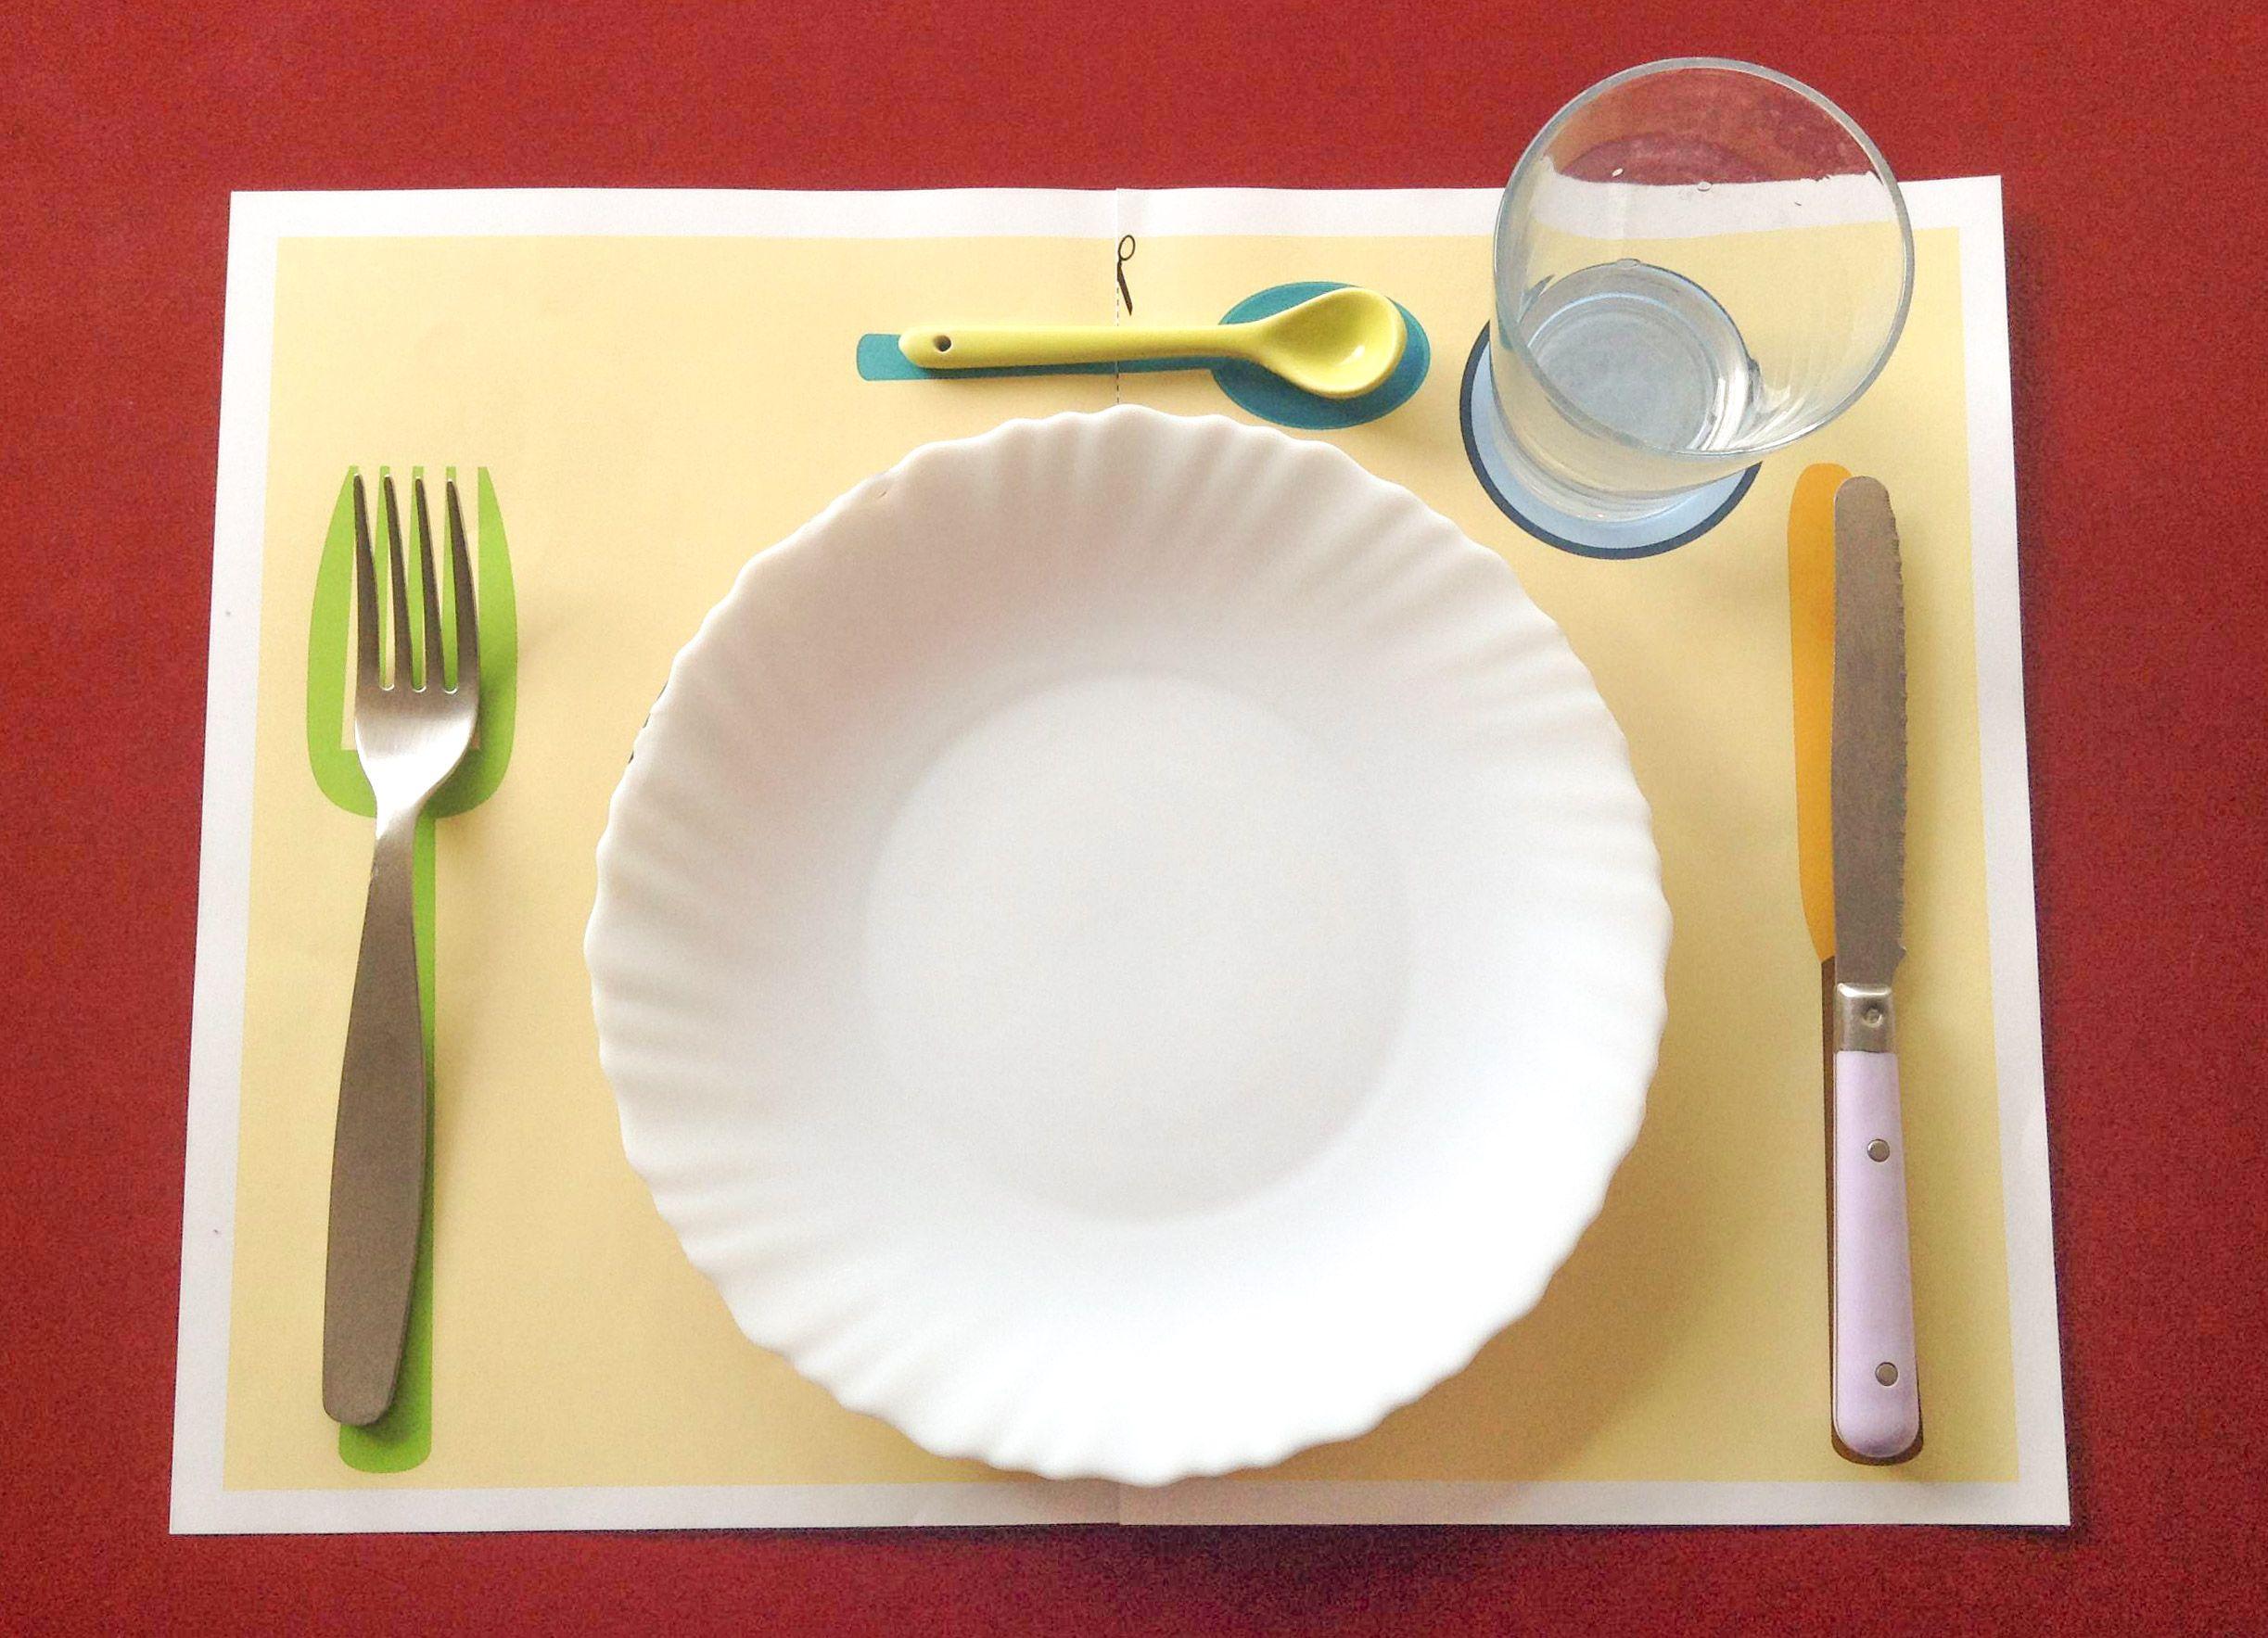 lui apprendre mettre la table facilement inspiration montessori pinterest table mettre. Black Bedroom Furniture Sets. Home Design Ideas